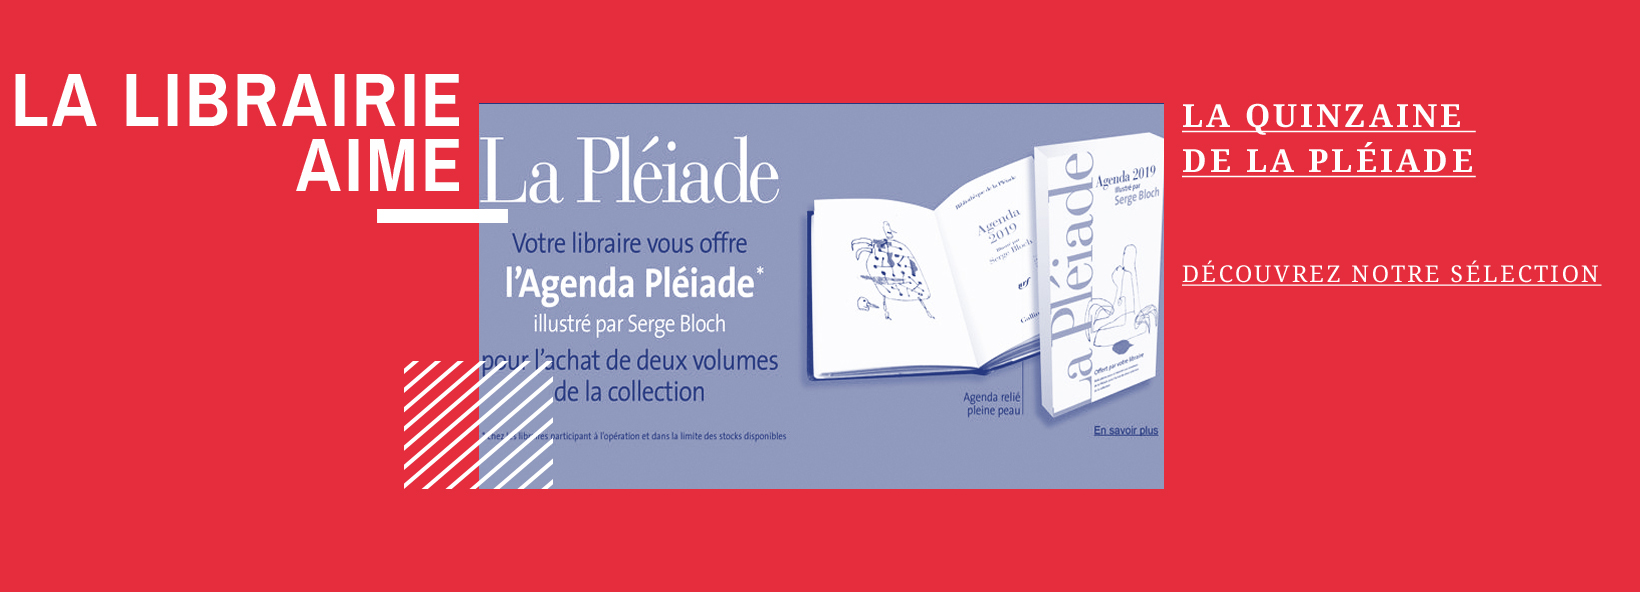 agenda Pléaide